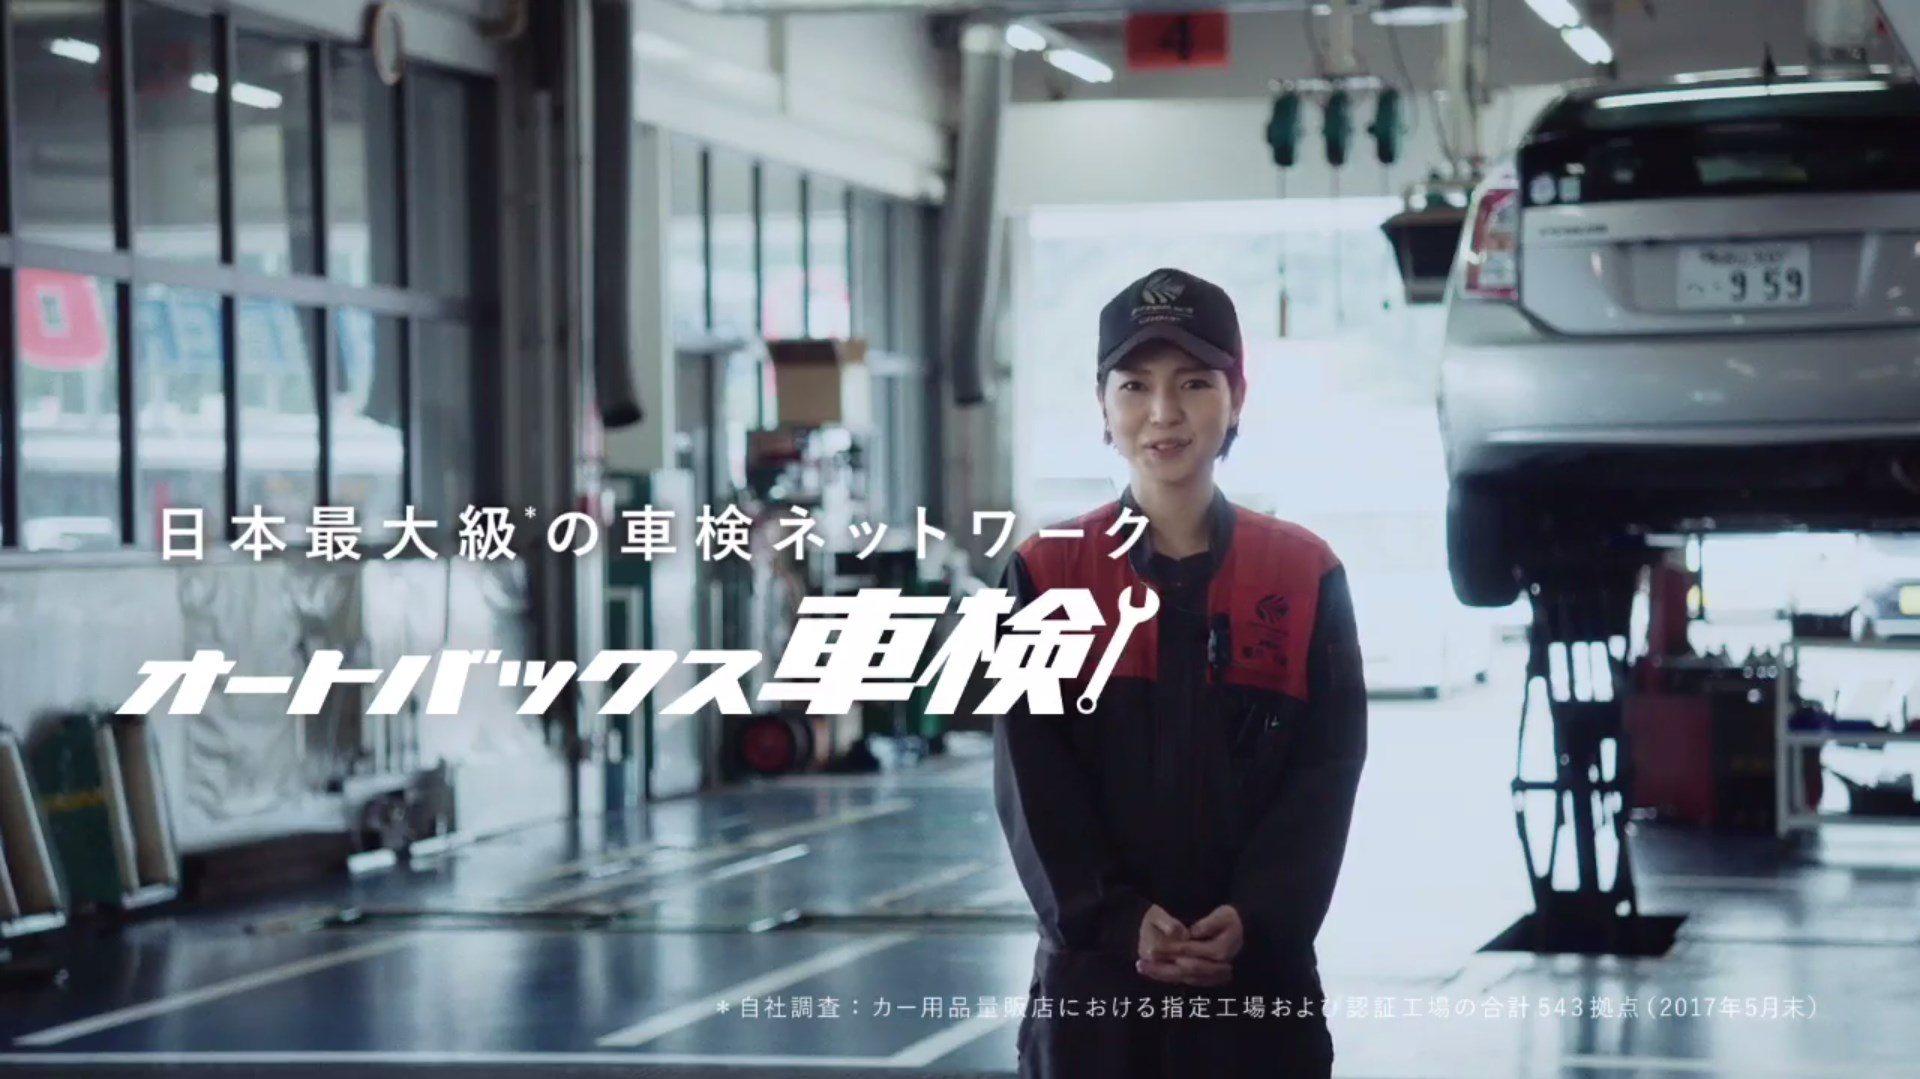 AUTOBACS GUYS 橋爪さん出演のWEB動画